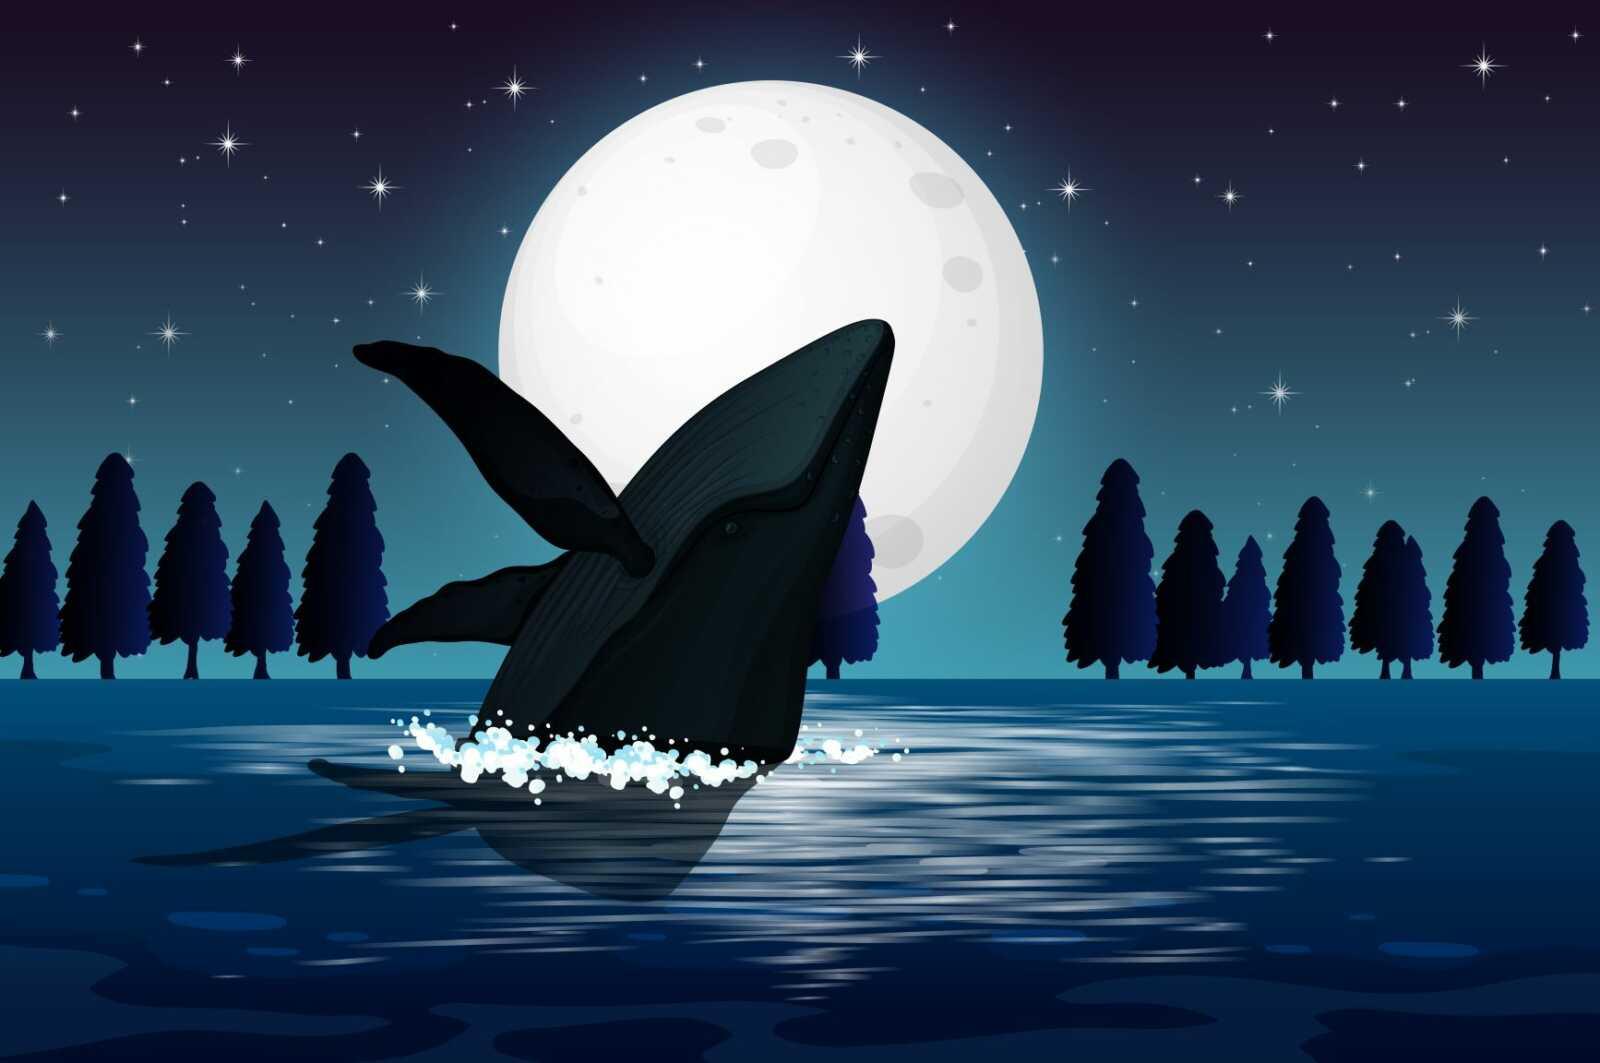 kripto balina tek harekette 615 milyon dolar harekete gecirdi 602117f8dab8e